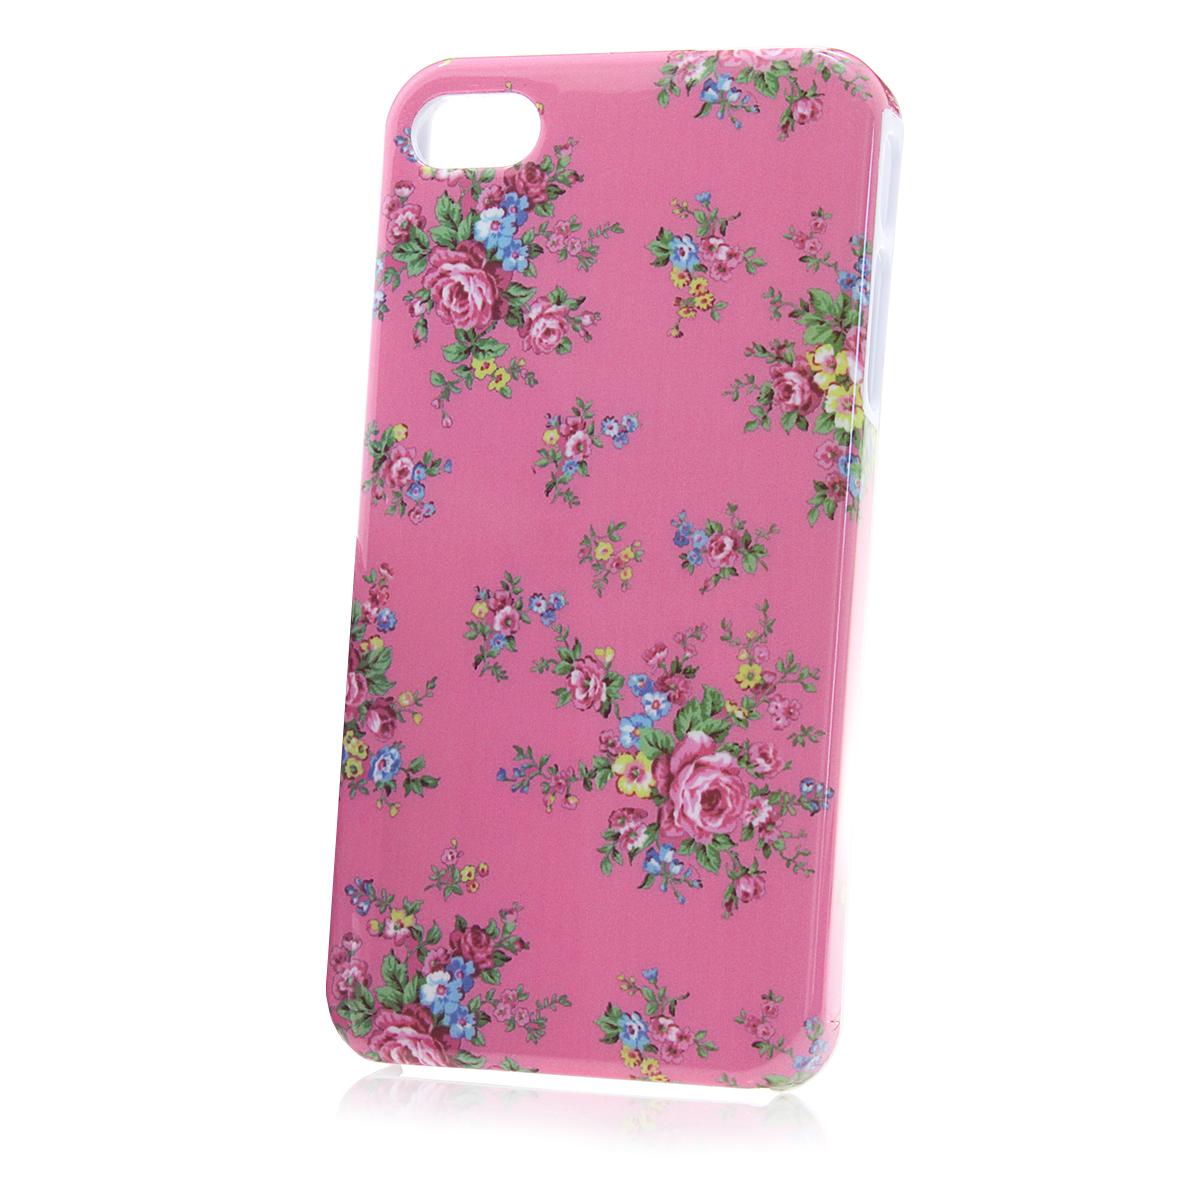 apple iphone 4 4s handy h lle case schale in rosa blumen. Black Bedroom Furniture Sets. Home Design Ideas